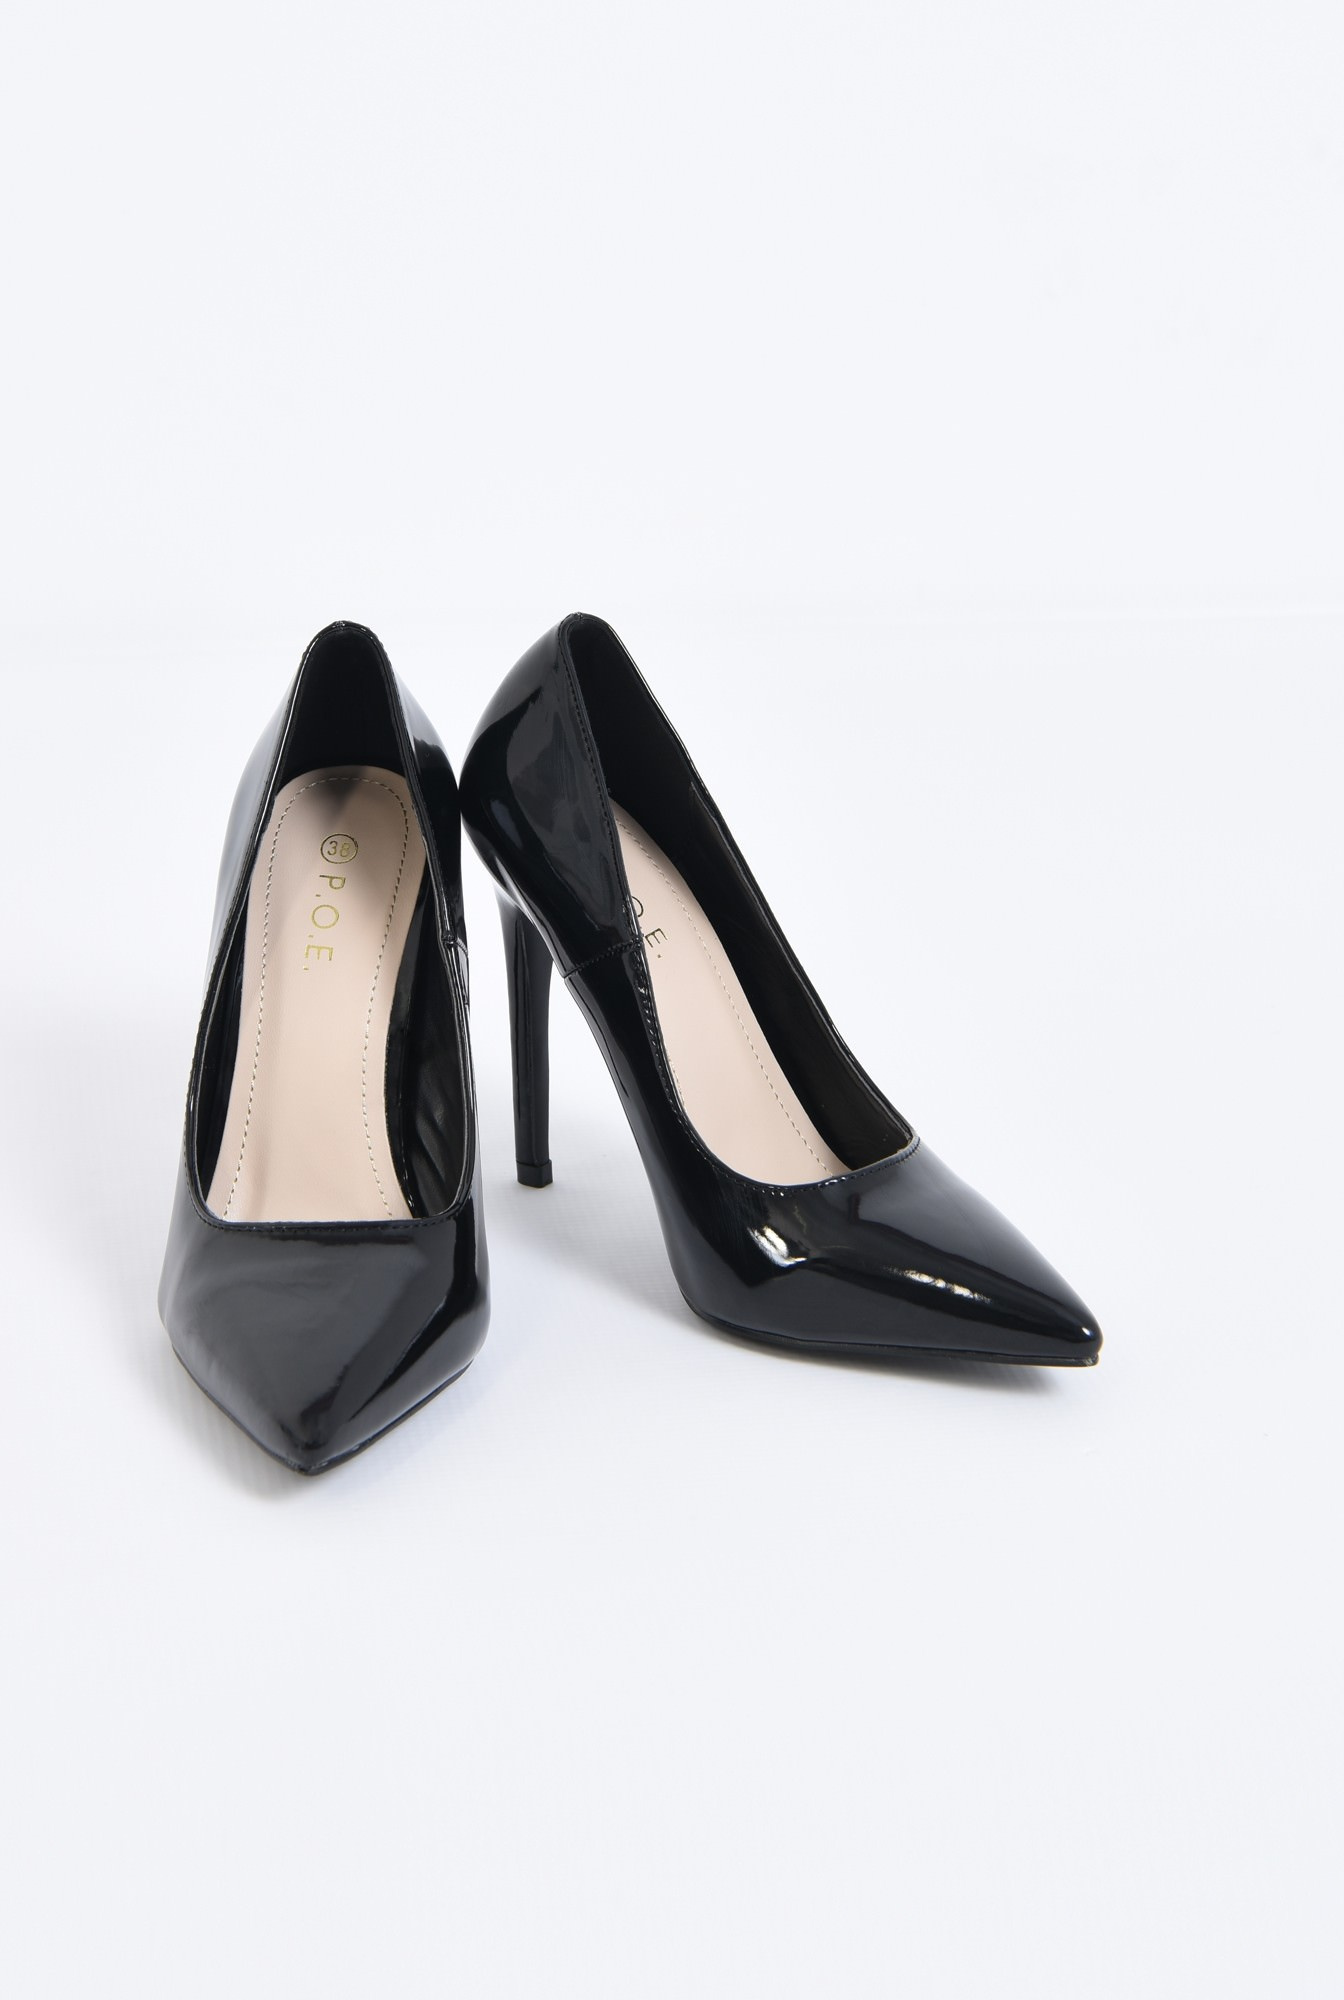 3 - pantofi eleganti, negri, lac, varf ascutit